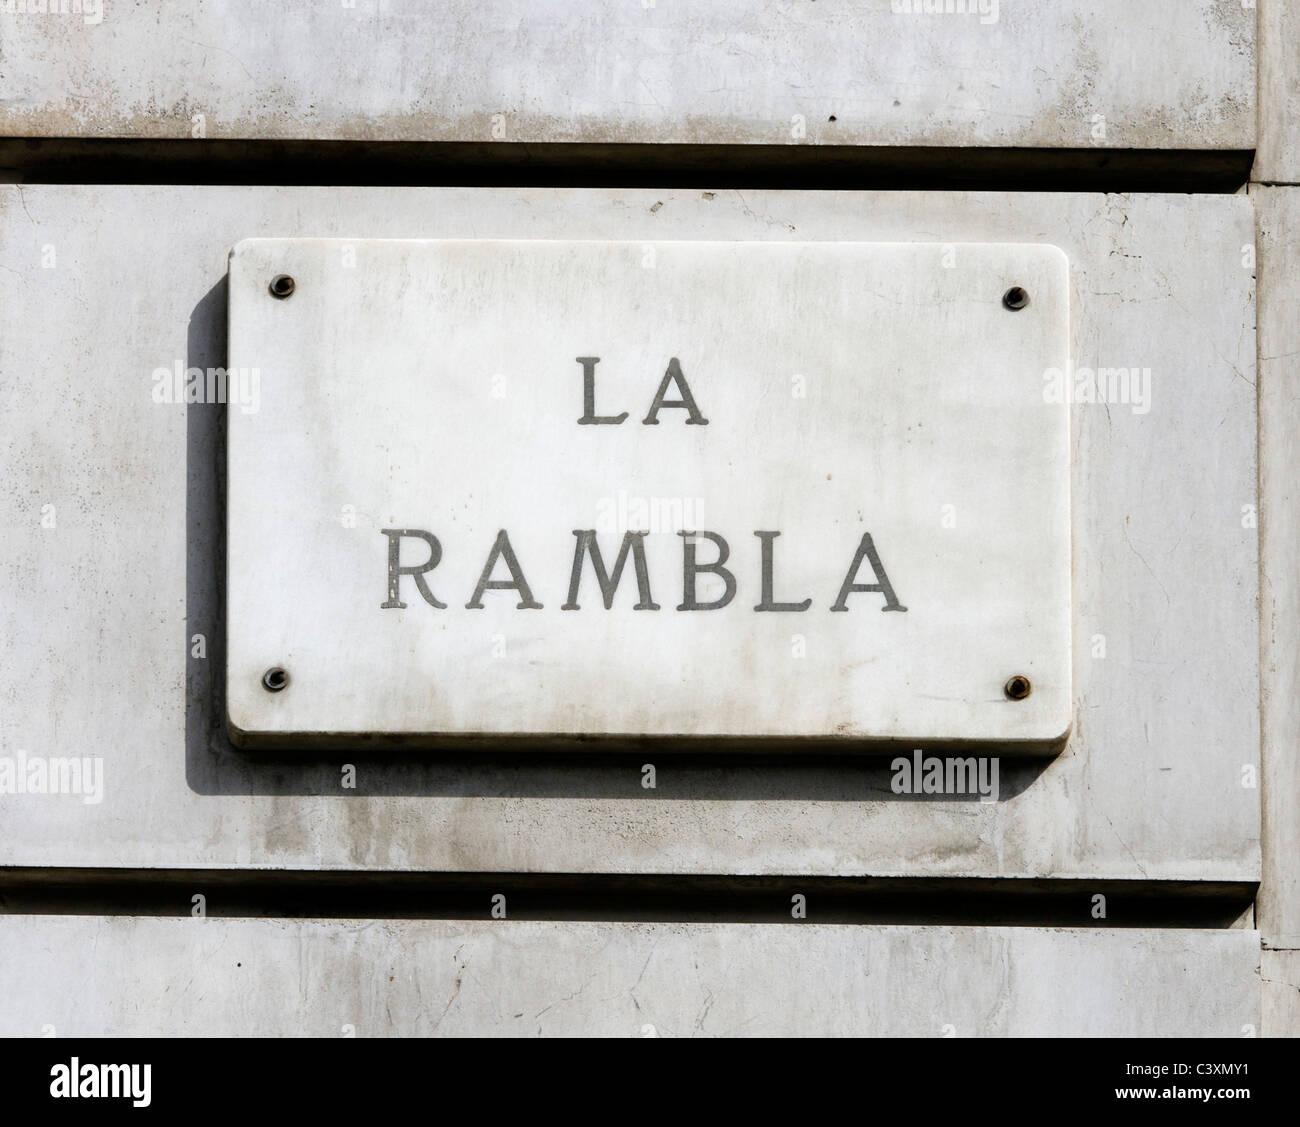 Street sign for La Rambla (Las Ramblas), Barcelona, Catalunya, Spain - Stock Image